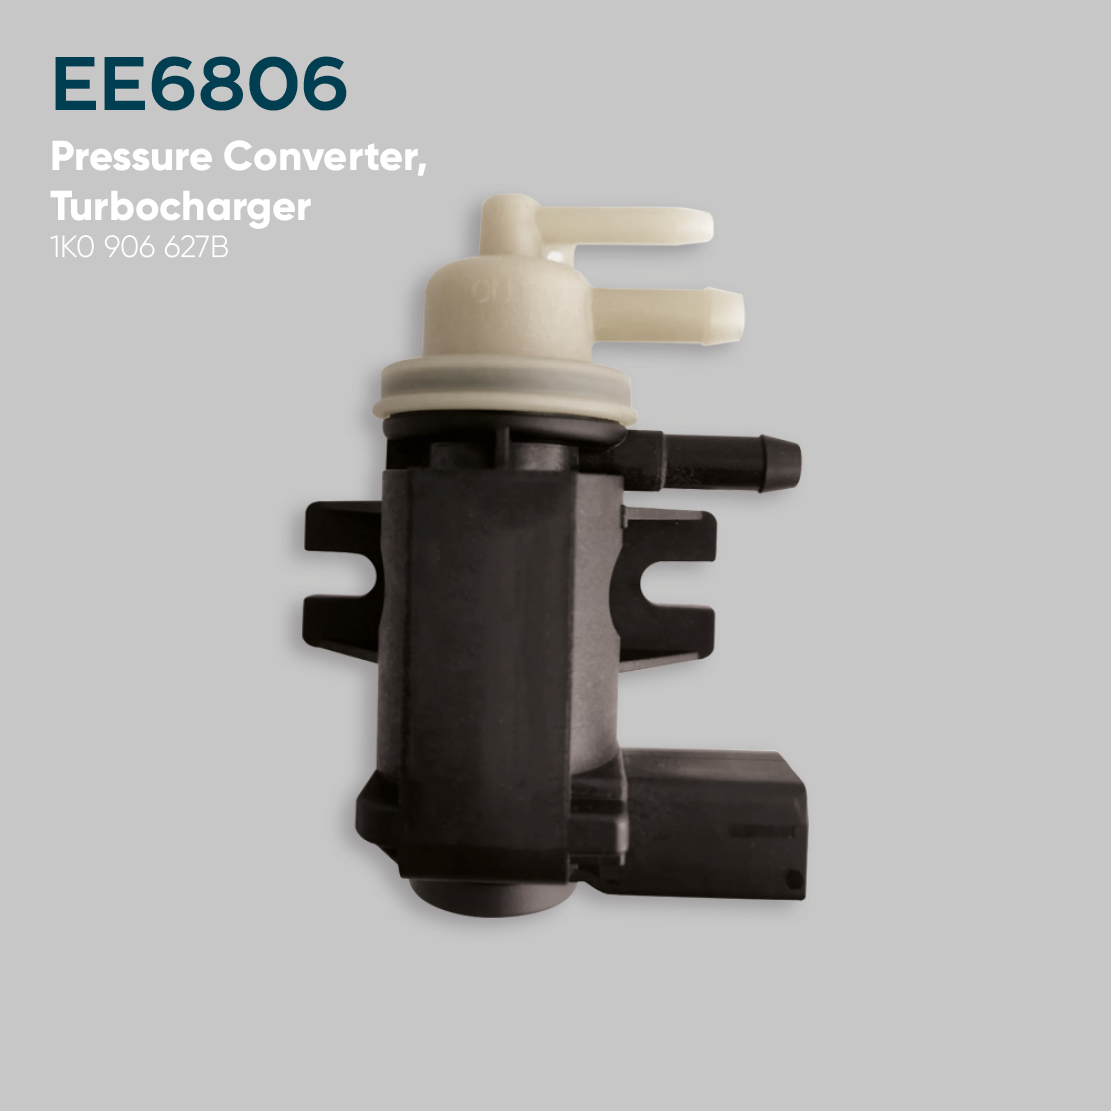 Audi A1 Pressure Converter Turbo